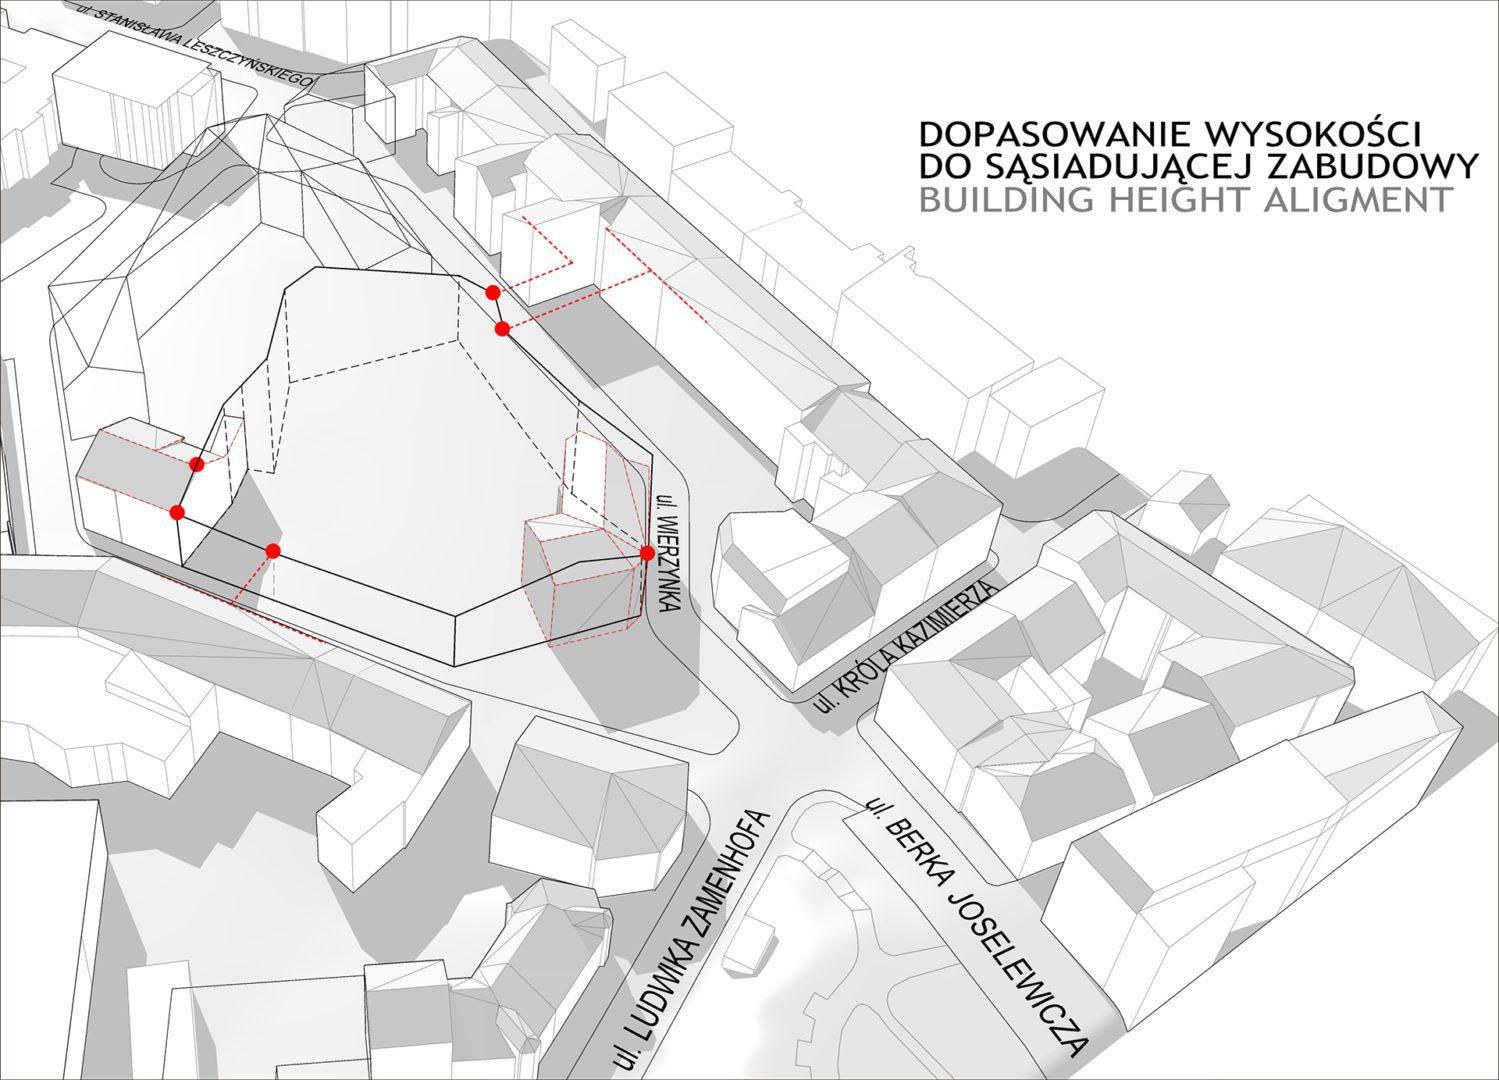 Plac-Garncarski-urban_development-5